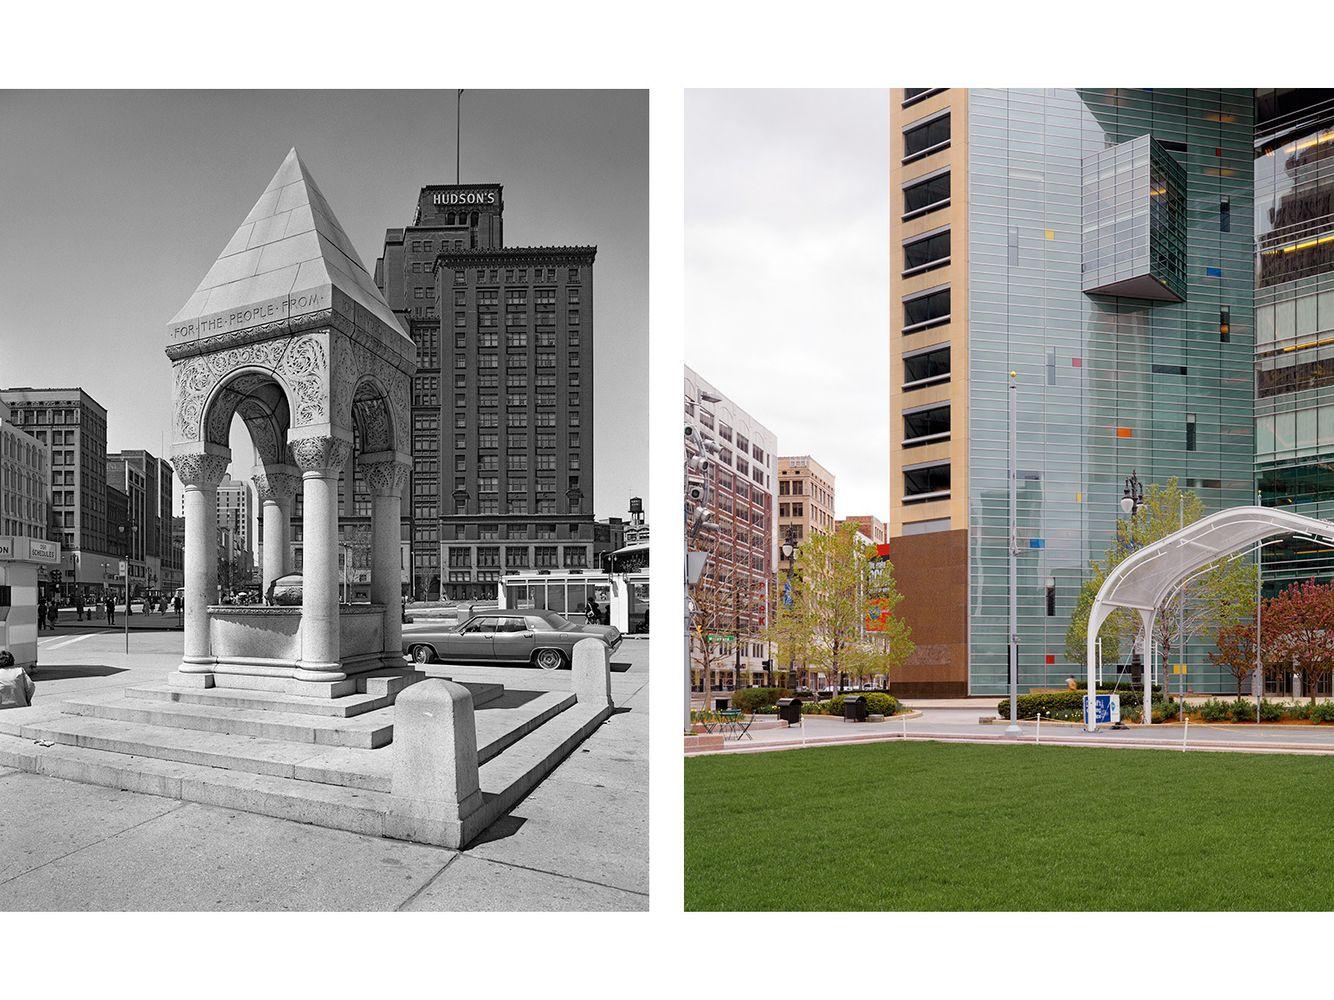 John Bagley Memorial, Campus Martius, Detroit 1973-2010